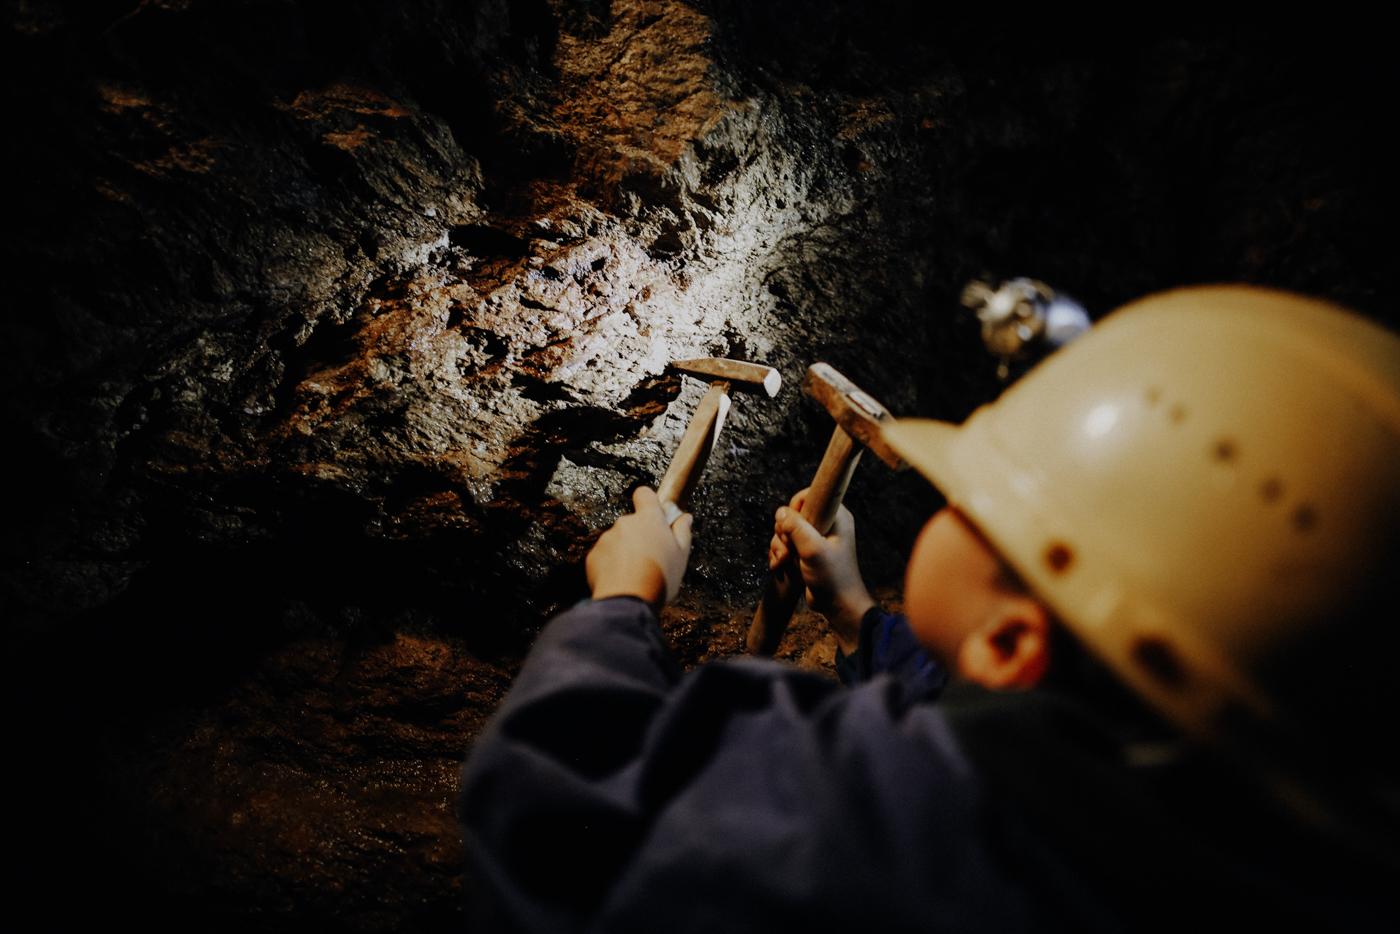 Bergbau im Erzgebirge erleben: 7 spannende Bergwerke & Ausflugsziele